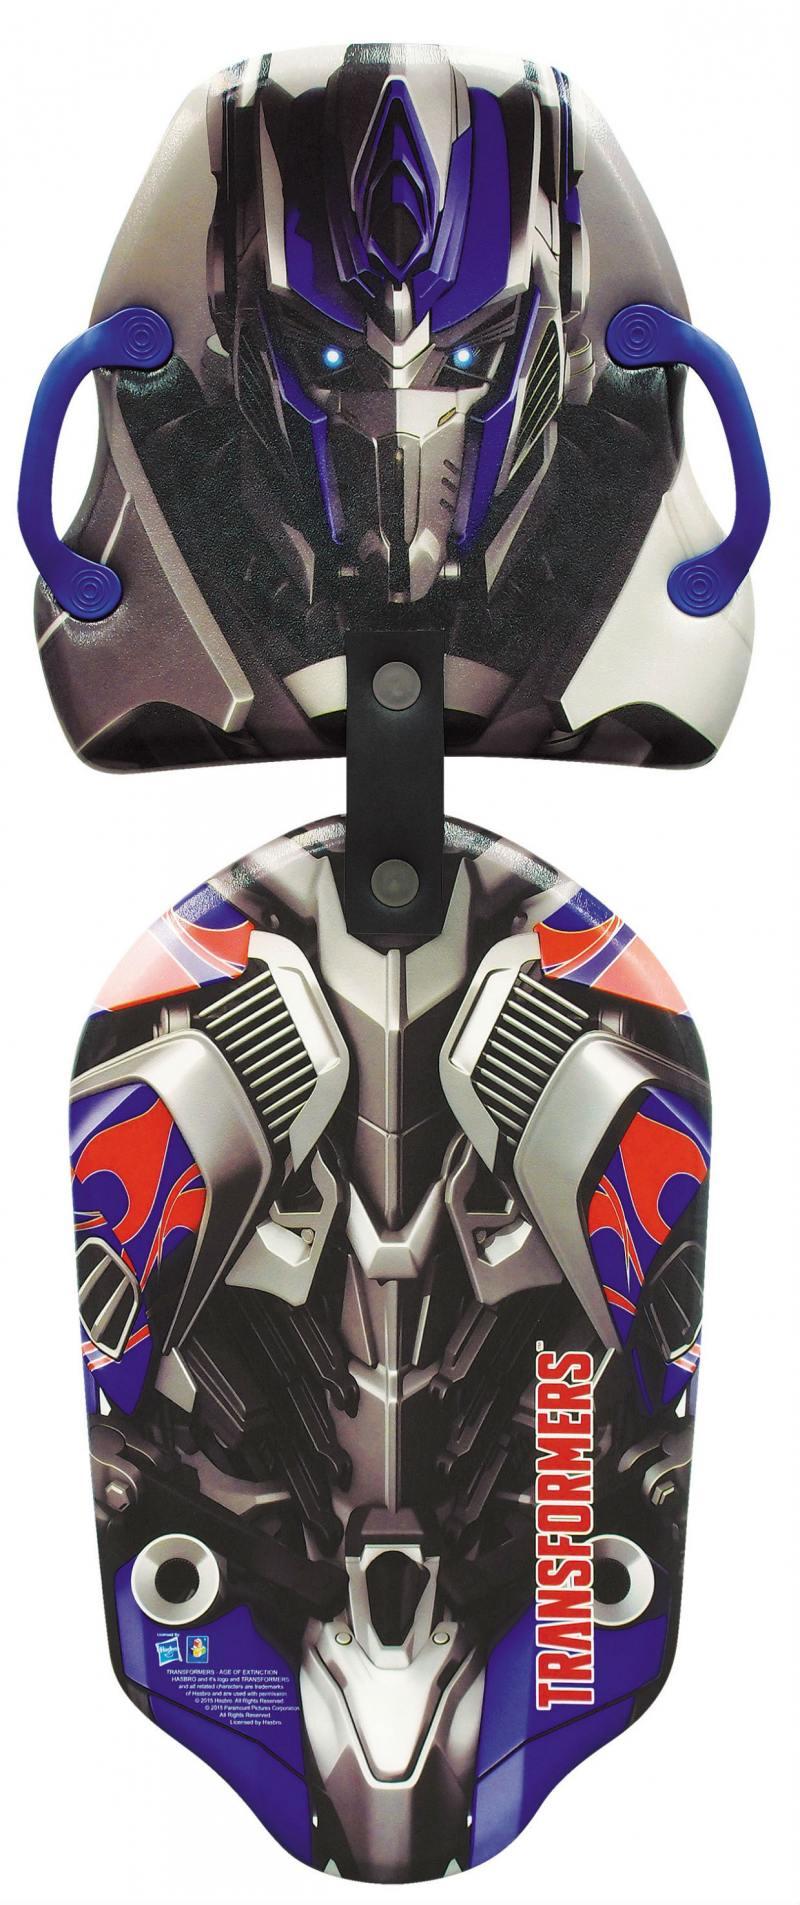 Ледянка 1Toy Transformers пластик рисунок Т56911 двойная